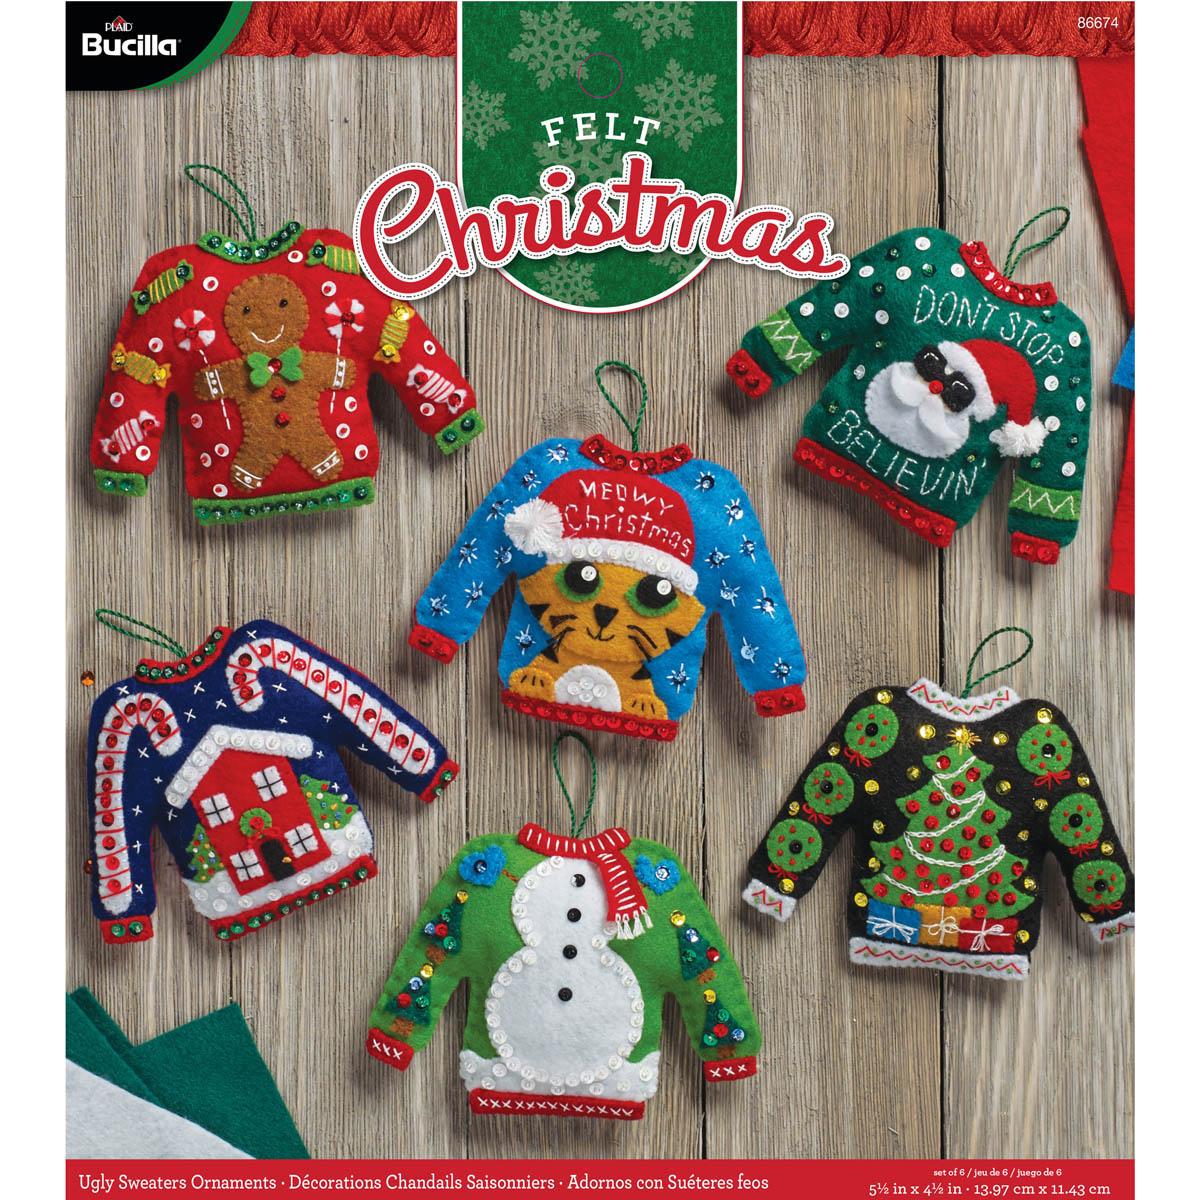 Bucilla ® Seasonal - Felt - Ornament Kits - Ugly Sweaters - 86674